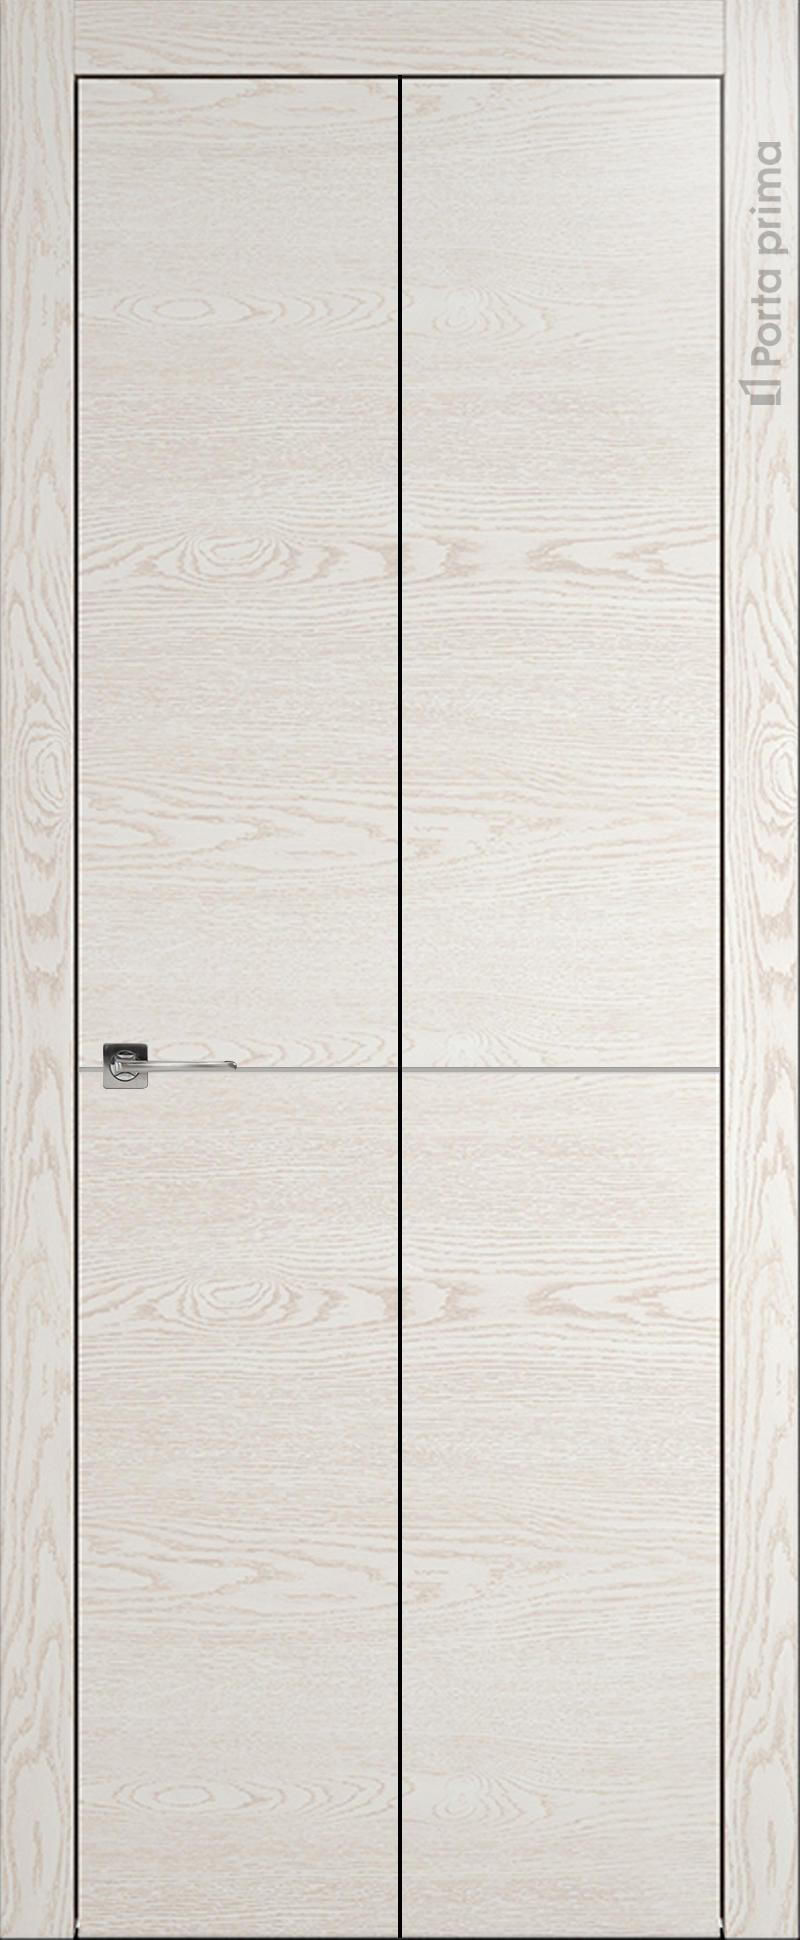 Tivoli Б-2 Книжка цвет - Белый ясень Без стекла (ДГ)